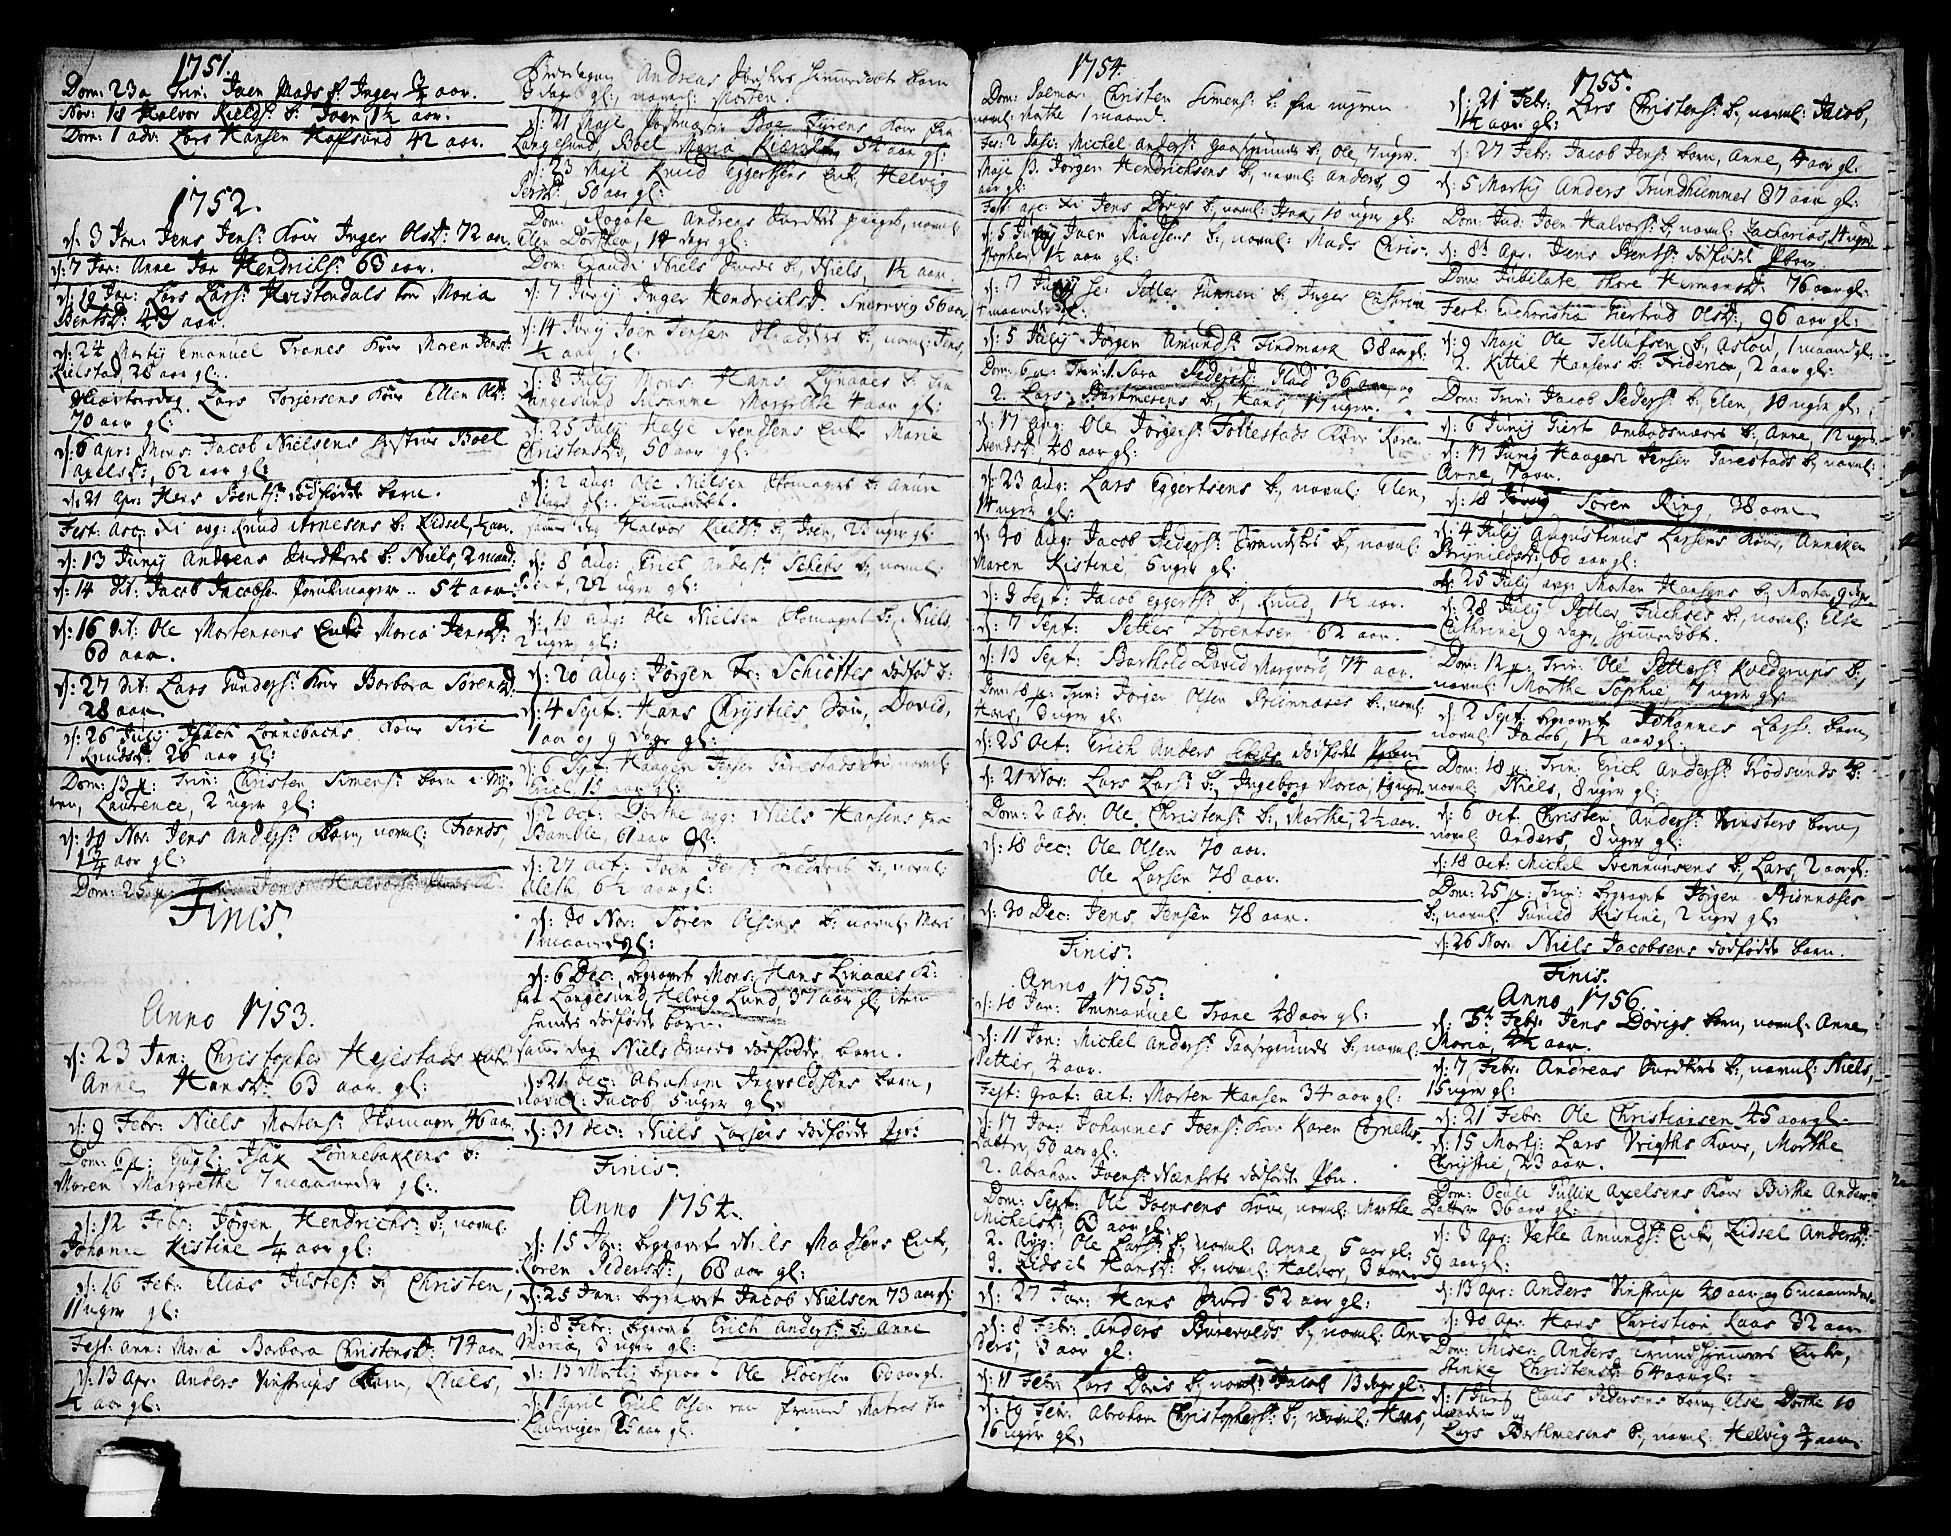 SAKO, Brevik kirkebøker, F/Fa/L0002: Ministerialbok nr. 2, 1720-1764, s. 58d